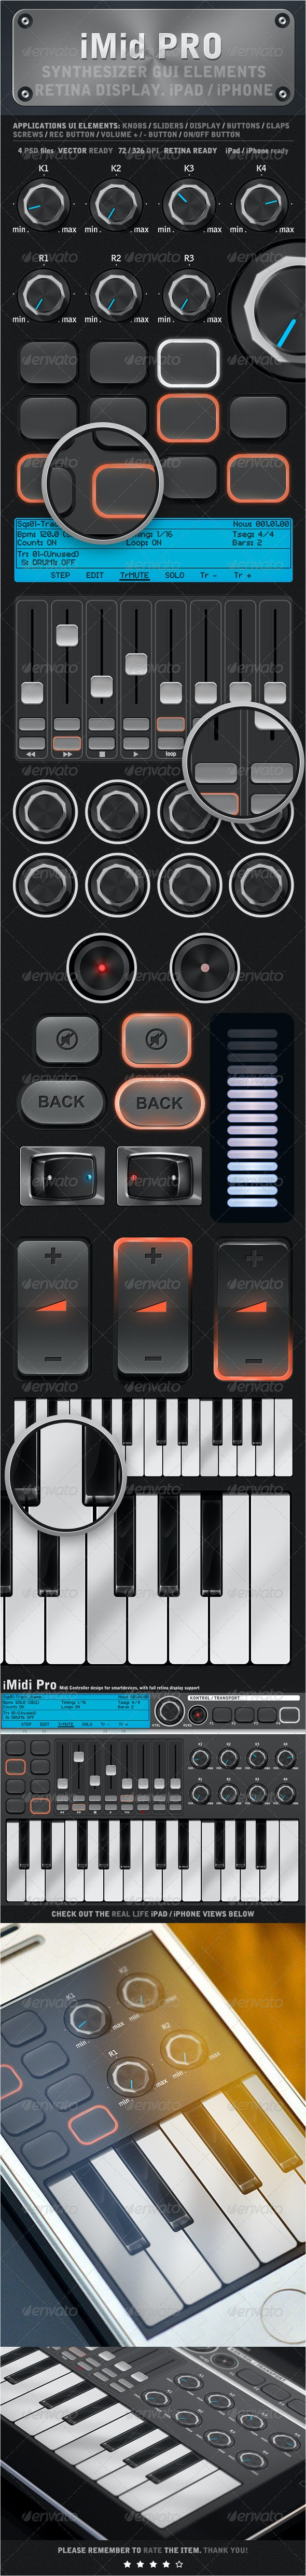 iMidi iPad / iPhone UI Elements - User Interfaces Web Elements